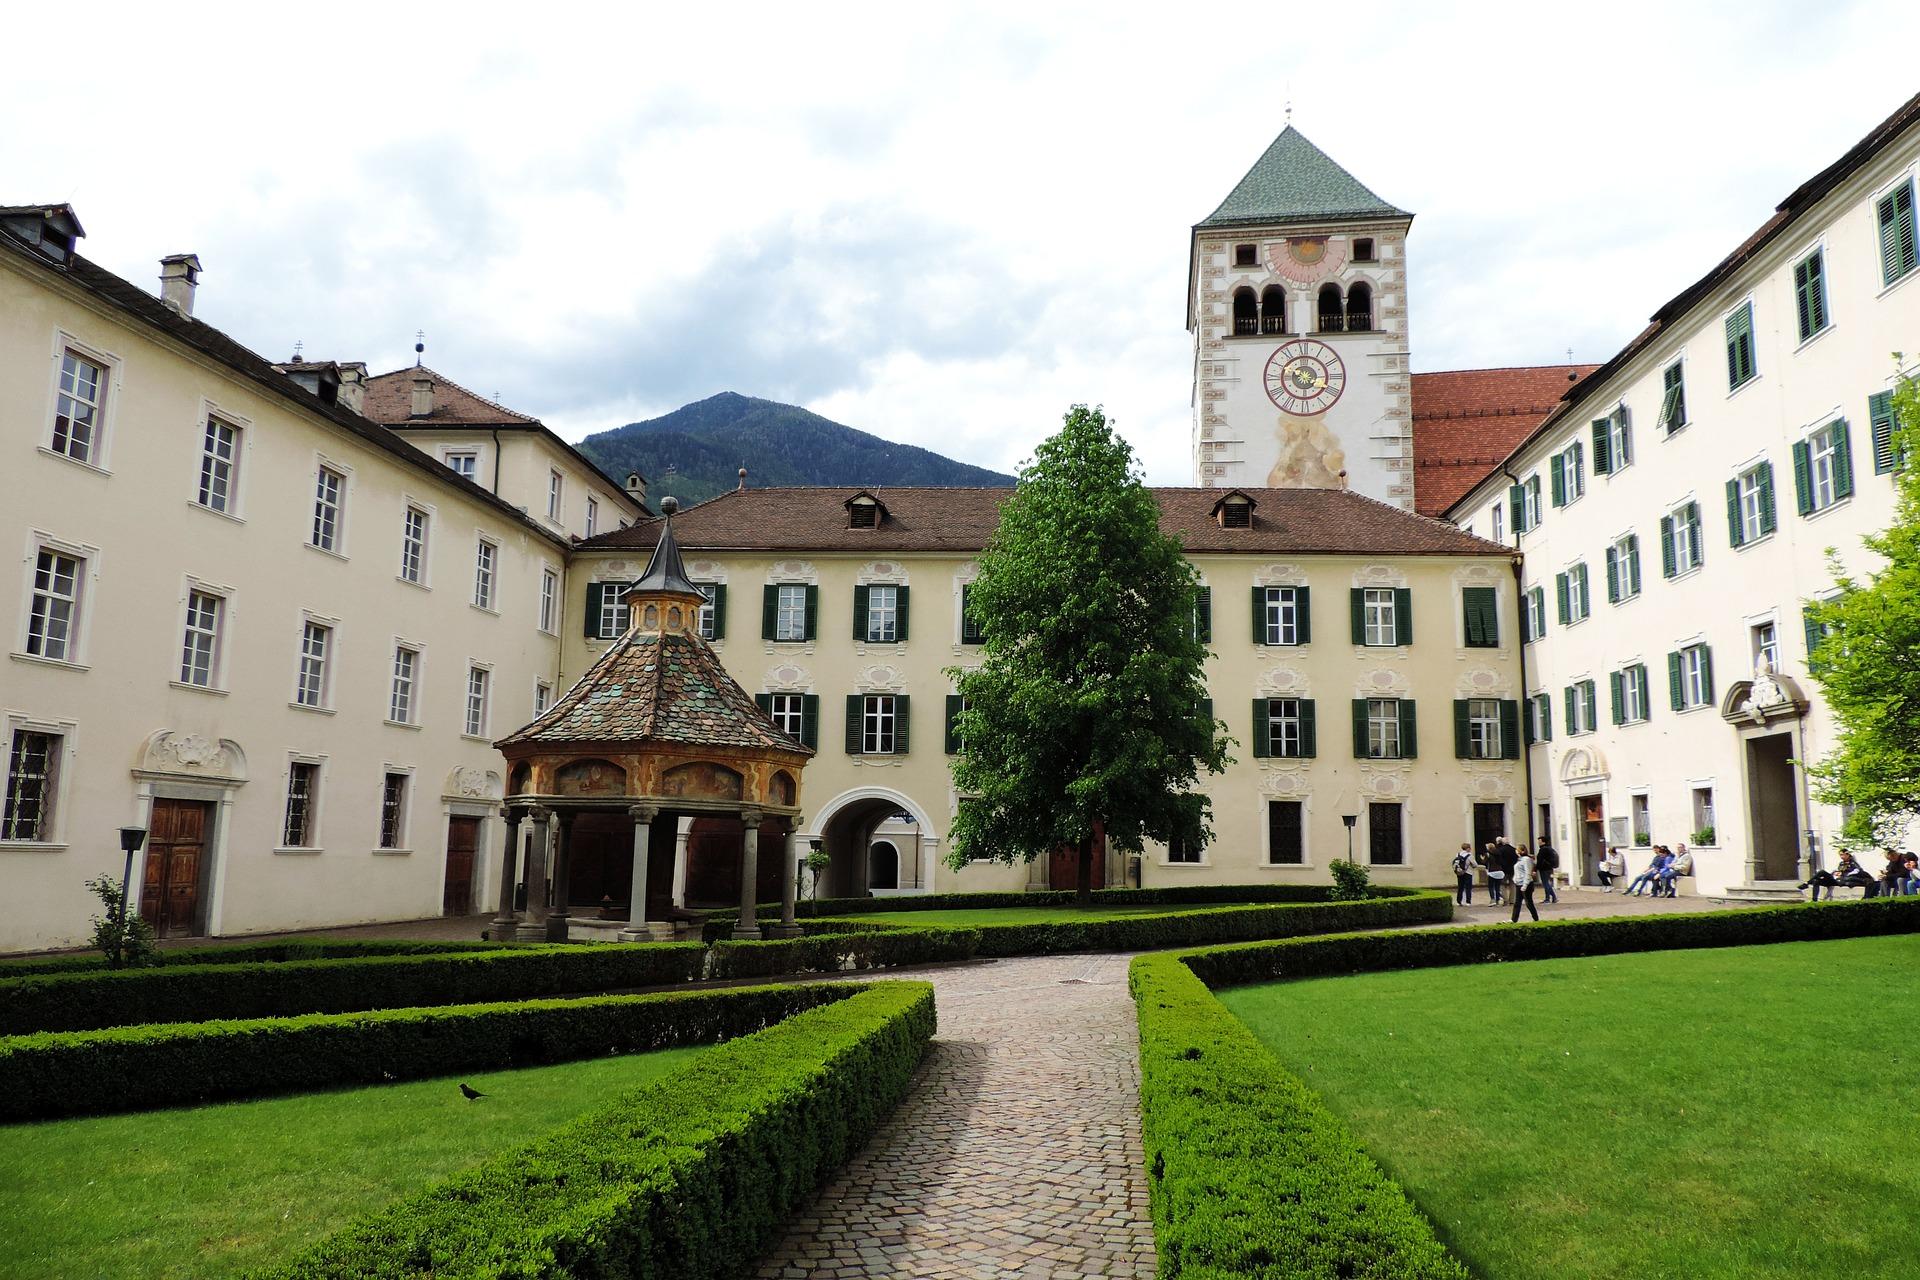 Novacella Abbey, Tyrol